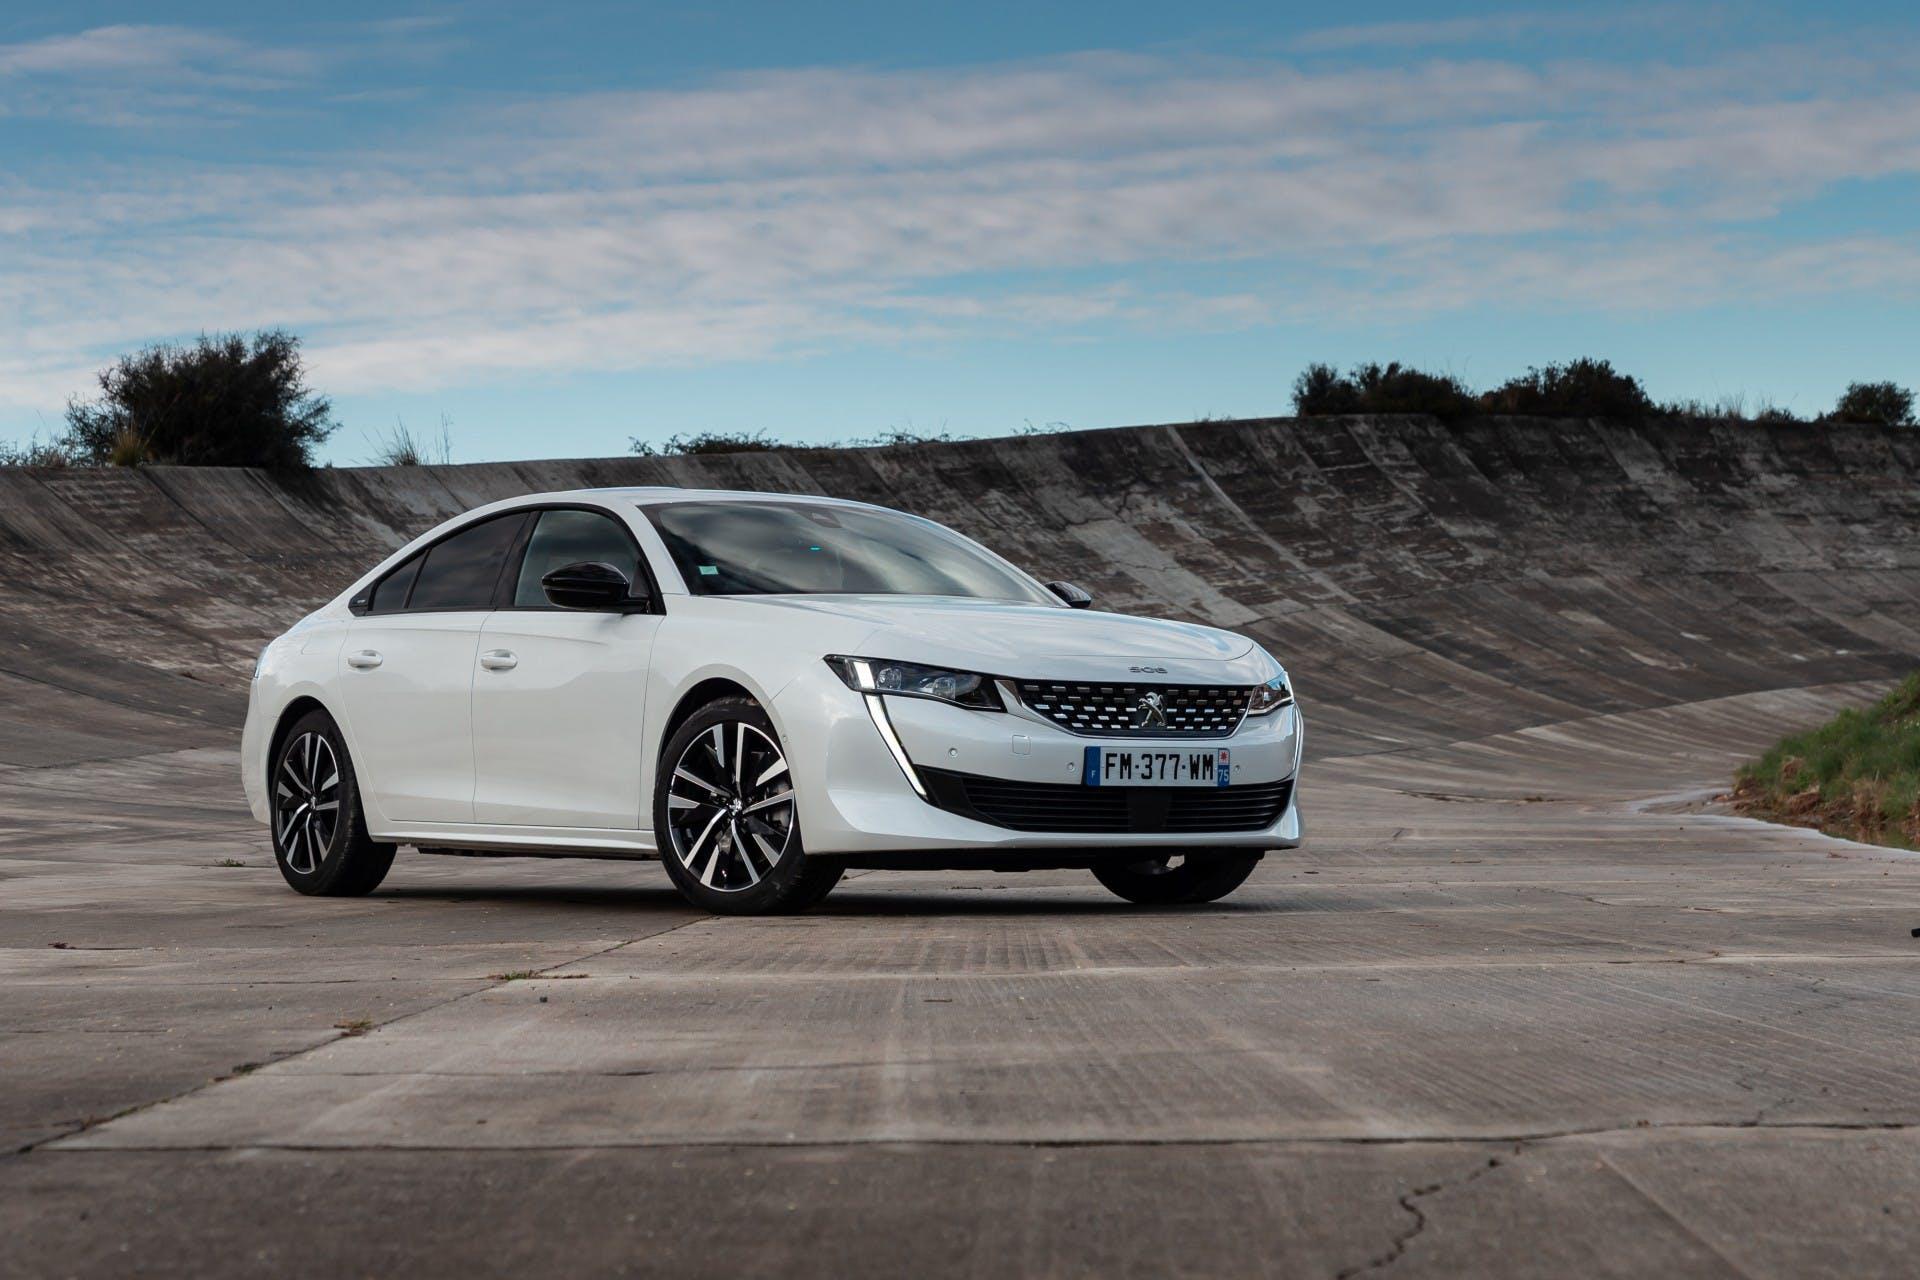 Peugeot-Elettrificate-508-hybrid-2020_00009